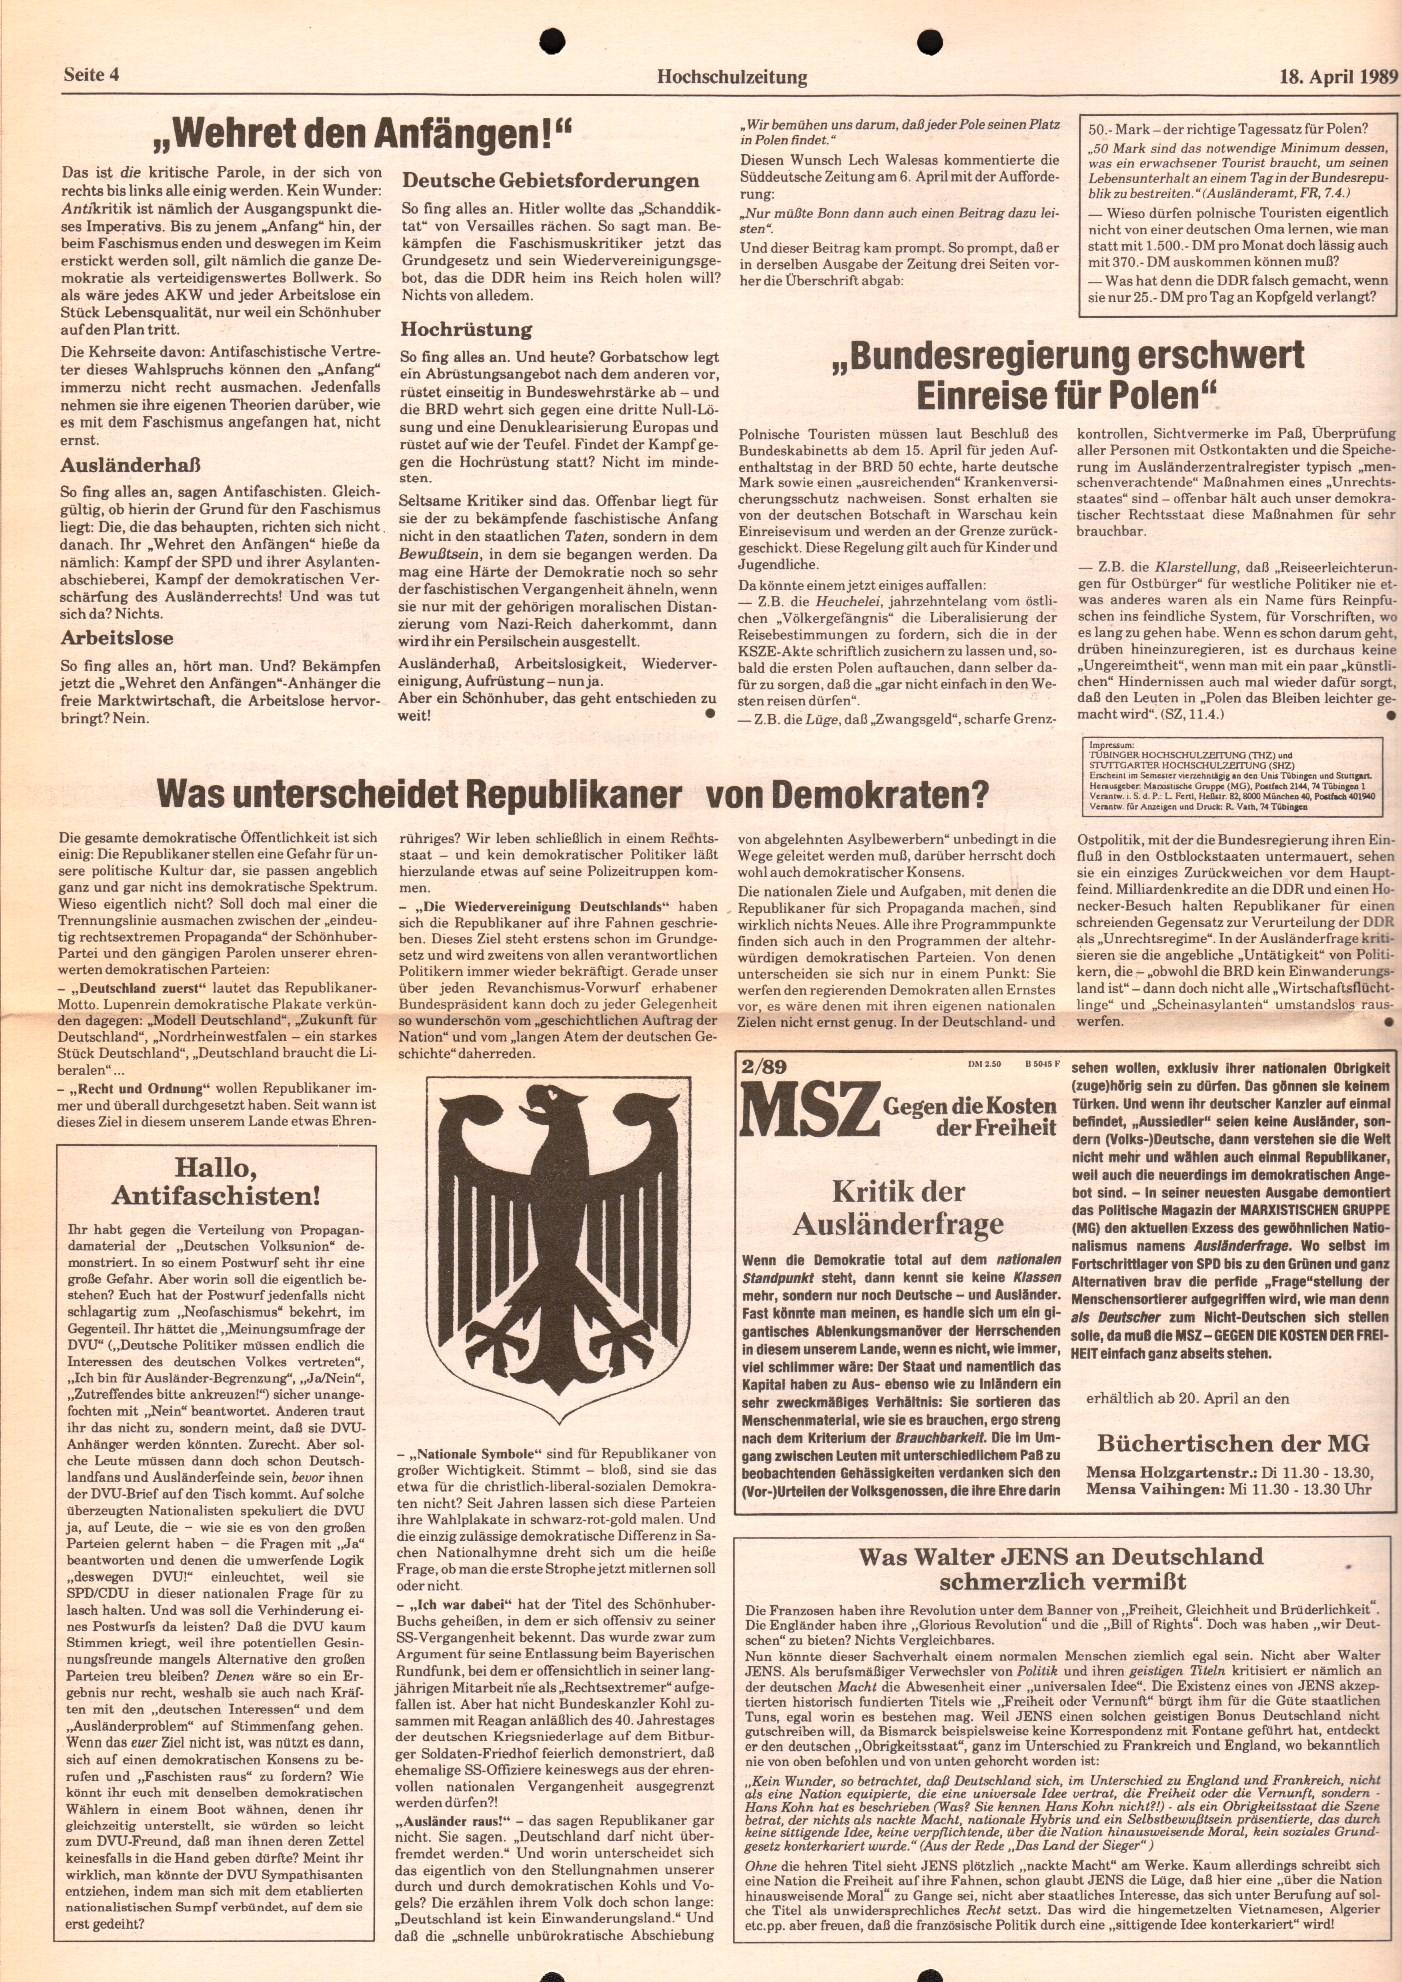 Stuttgart_MG_Hochschulzeitung_1989_04_04